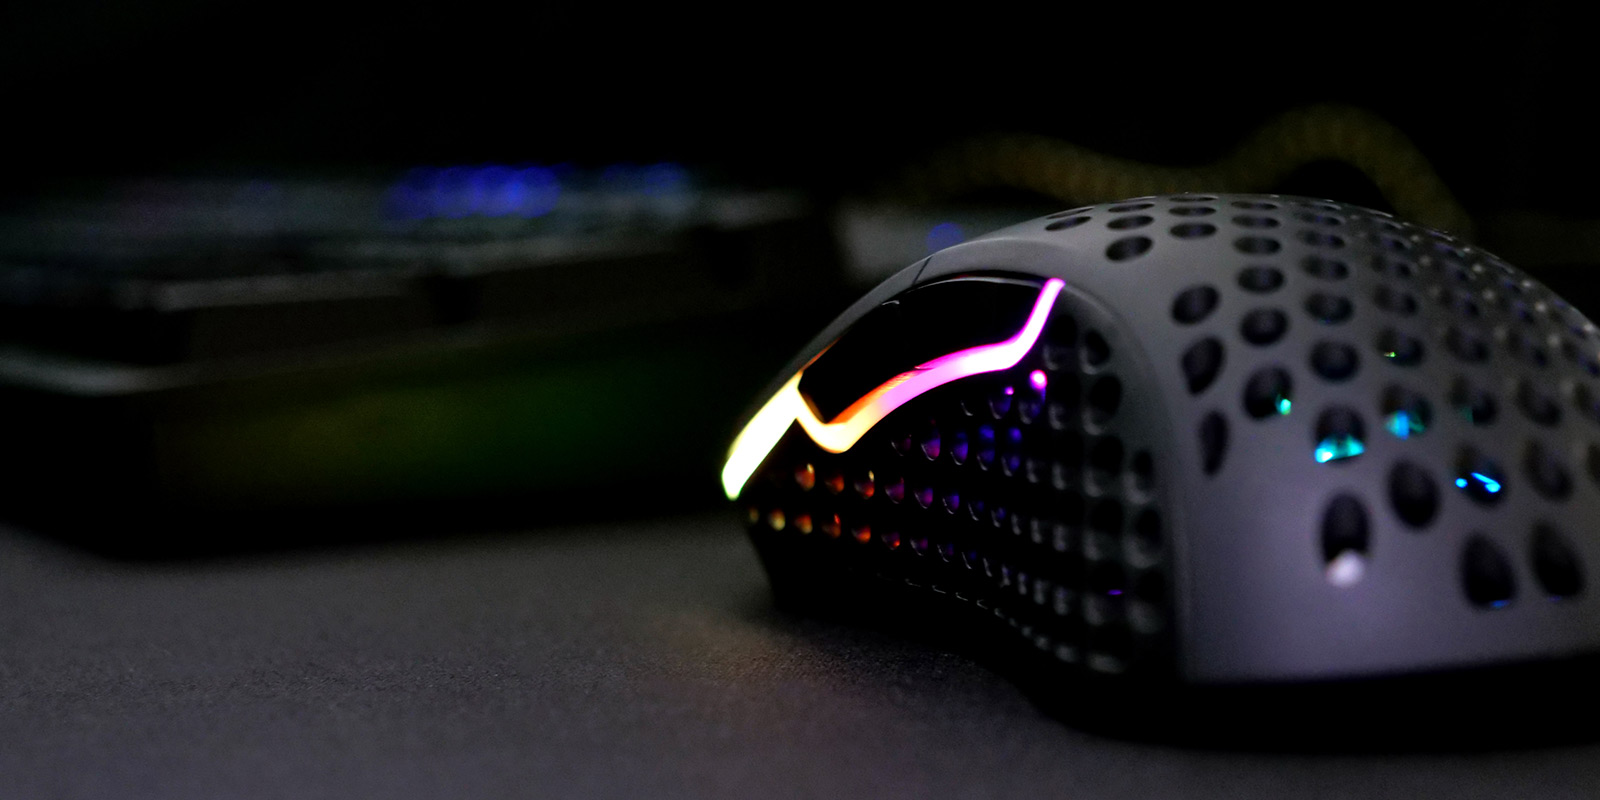 компьютерная мышь с дырками